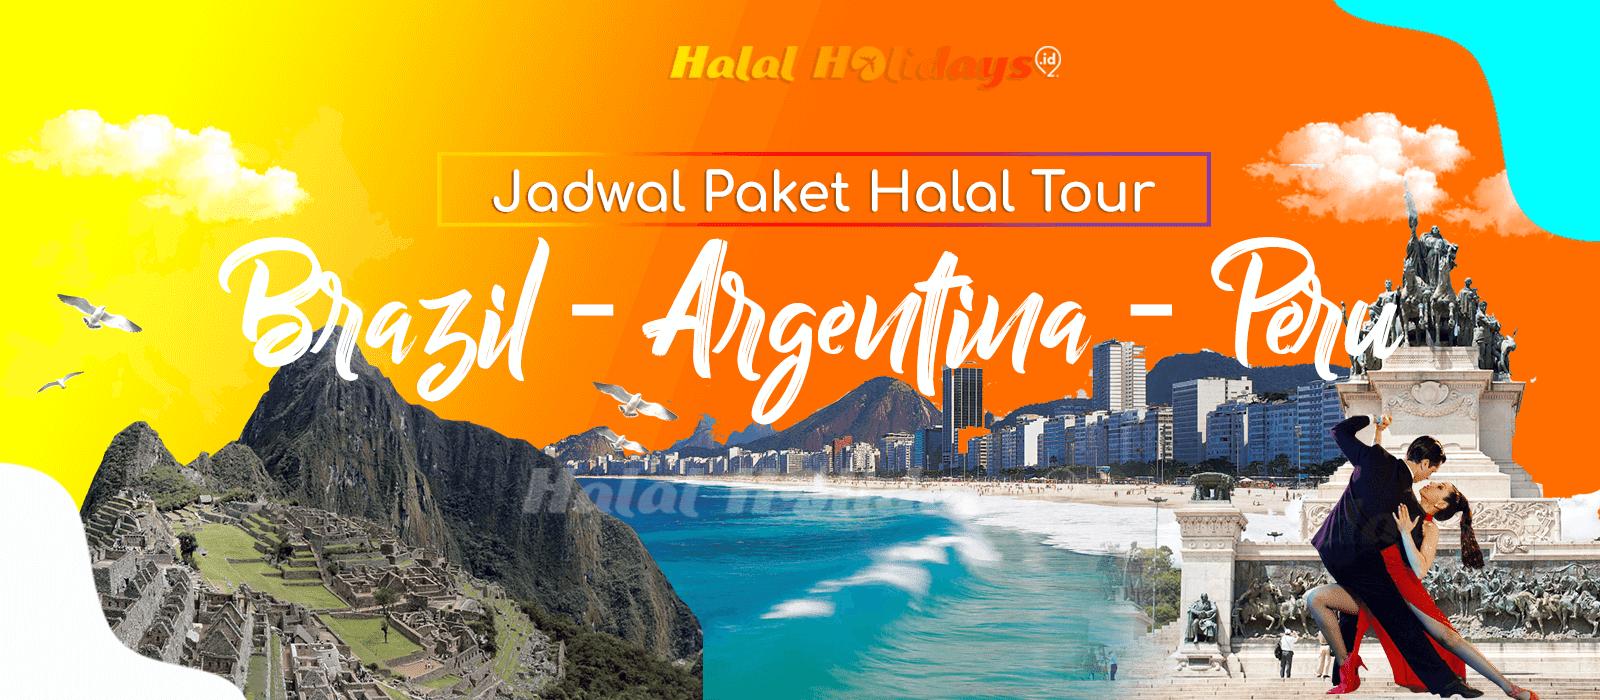 Paket Wisata Halal Tour Argentina Brazil Peru Tahun 2022 2023